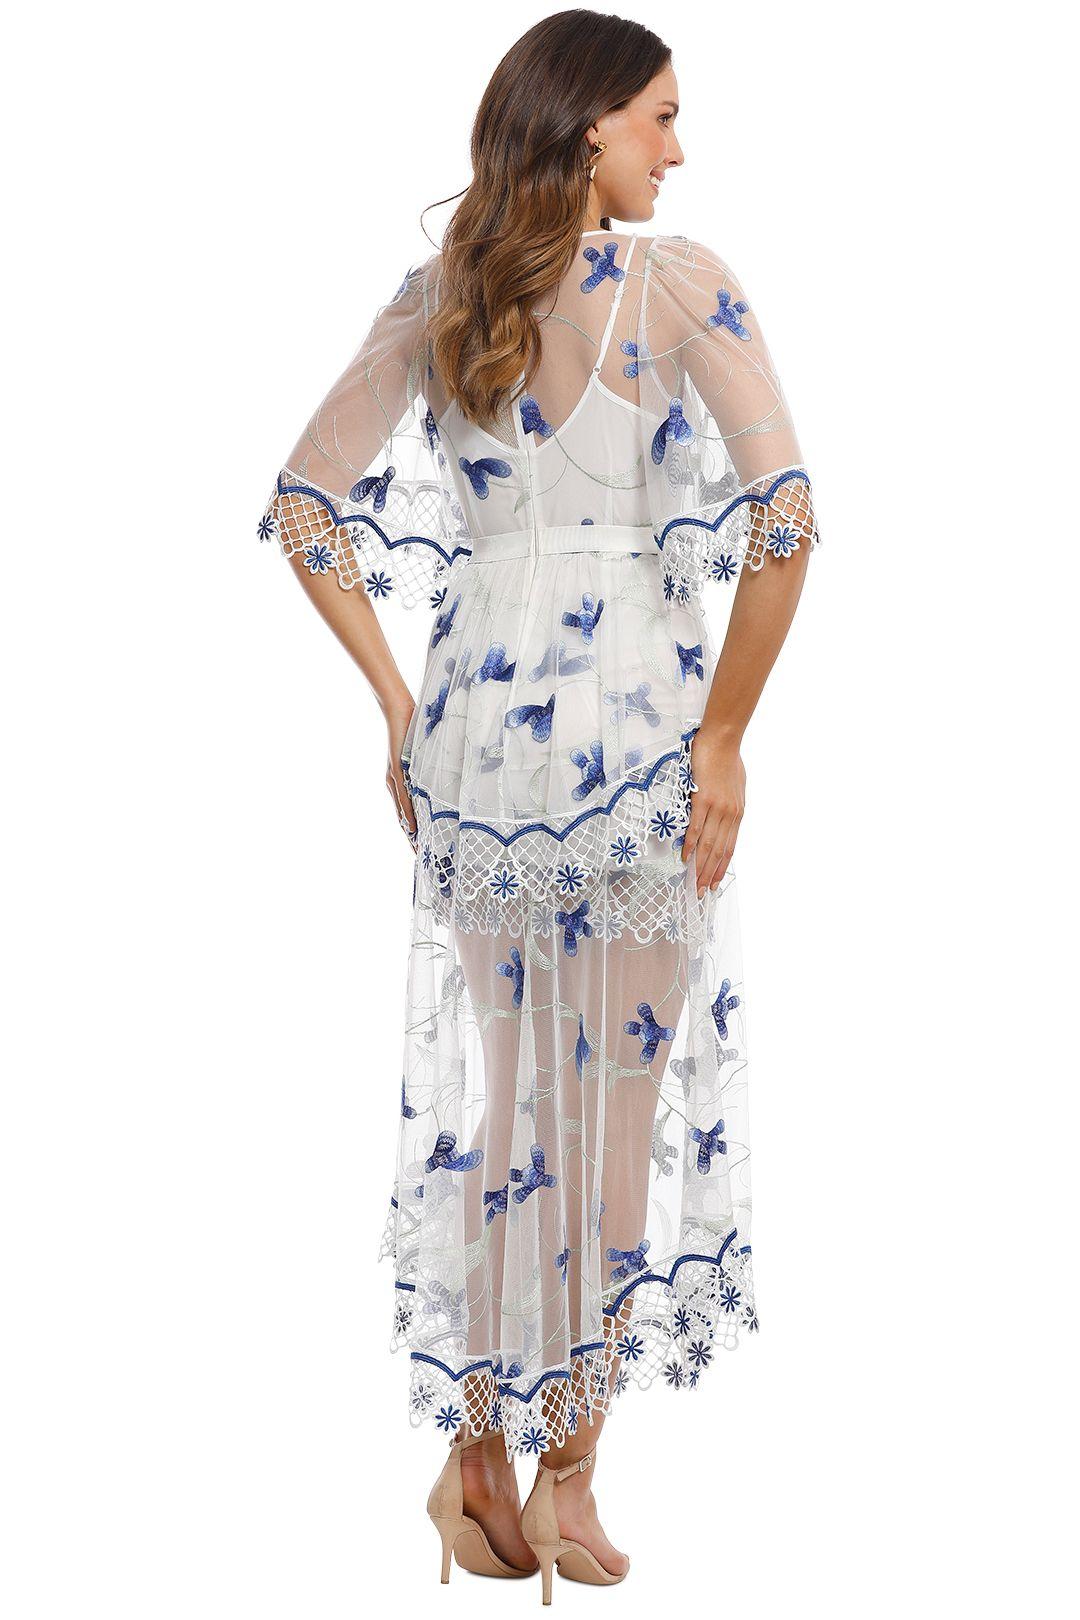 Alice McCall - Marigold Dress - Porcelain Sugarplum - Back